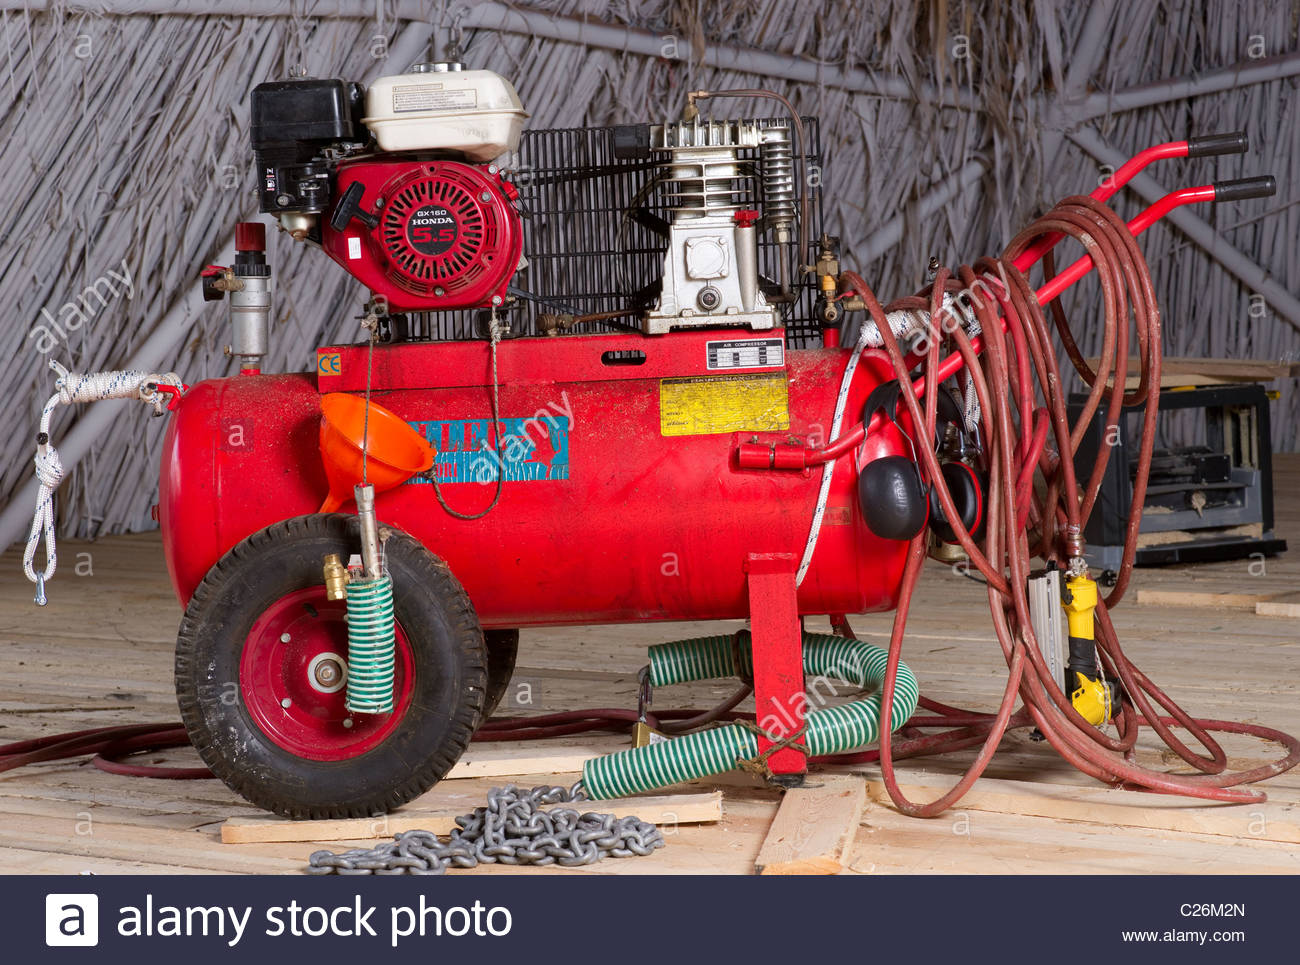 Air compressor petrol gasoline engine powered independent red compressors - Stock Image